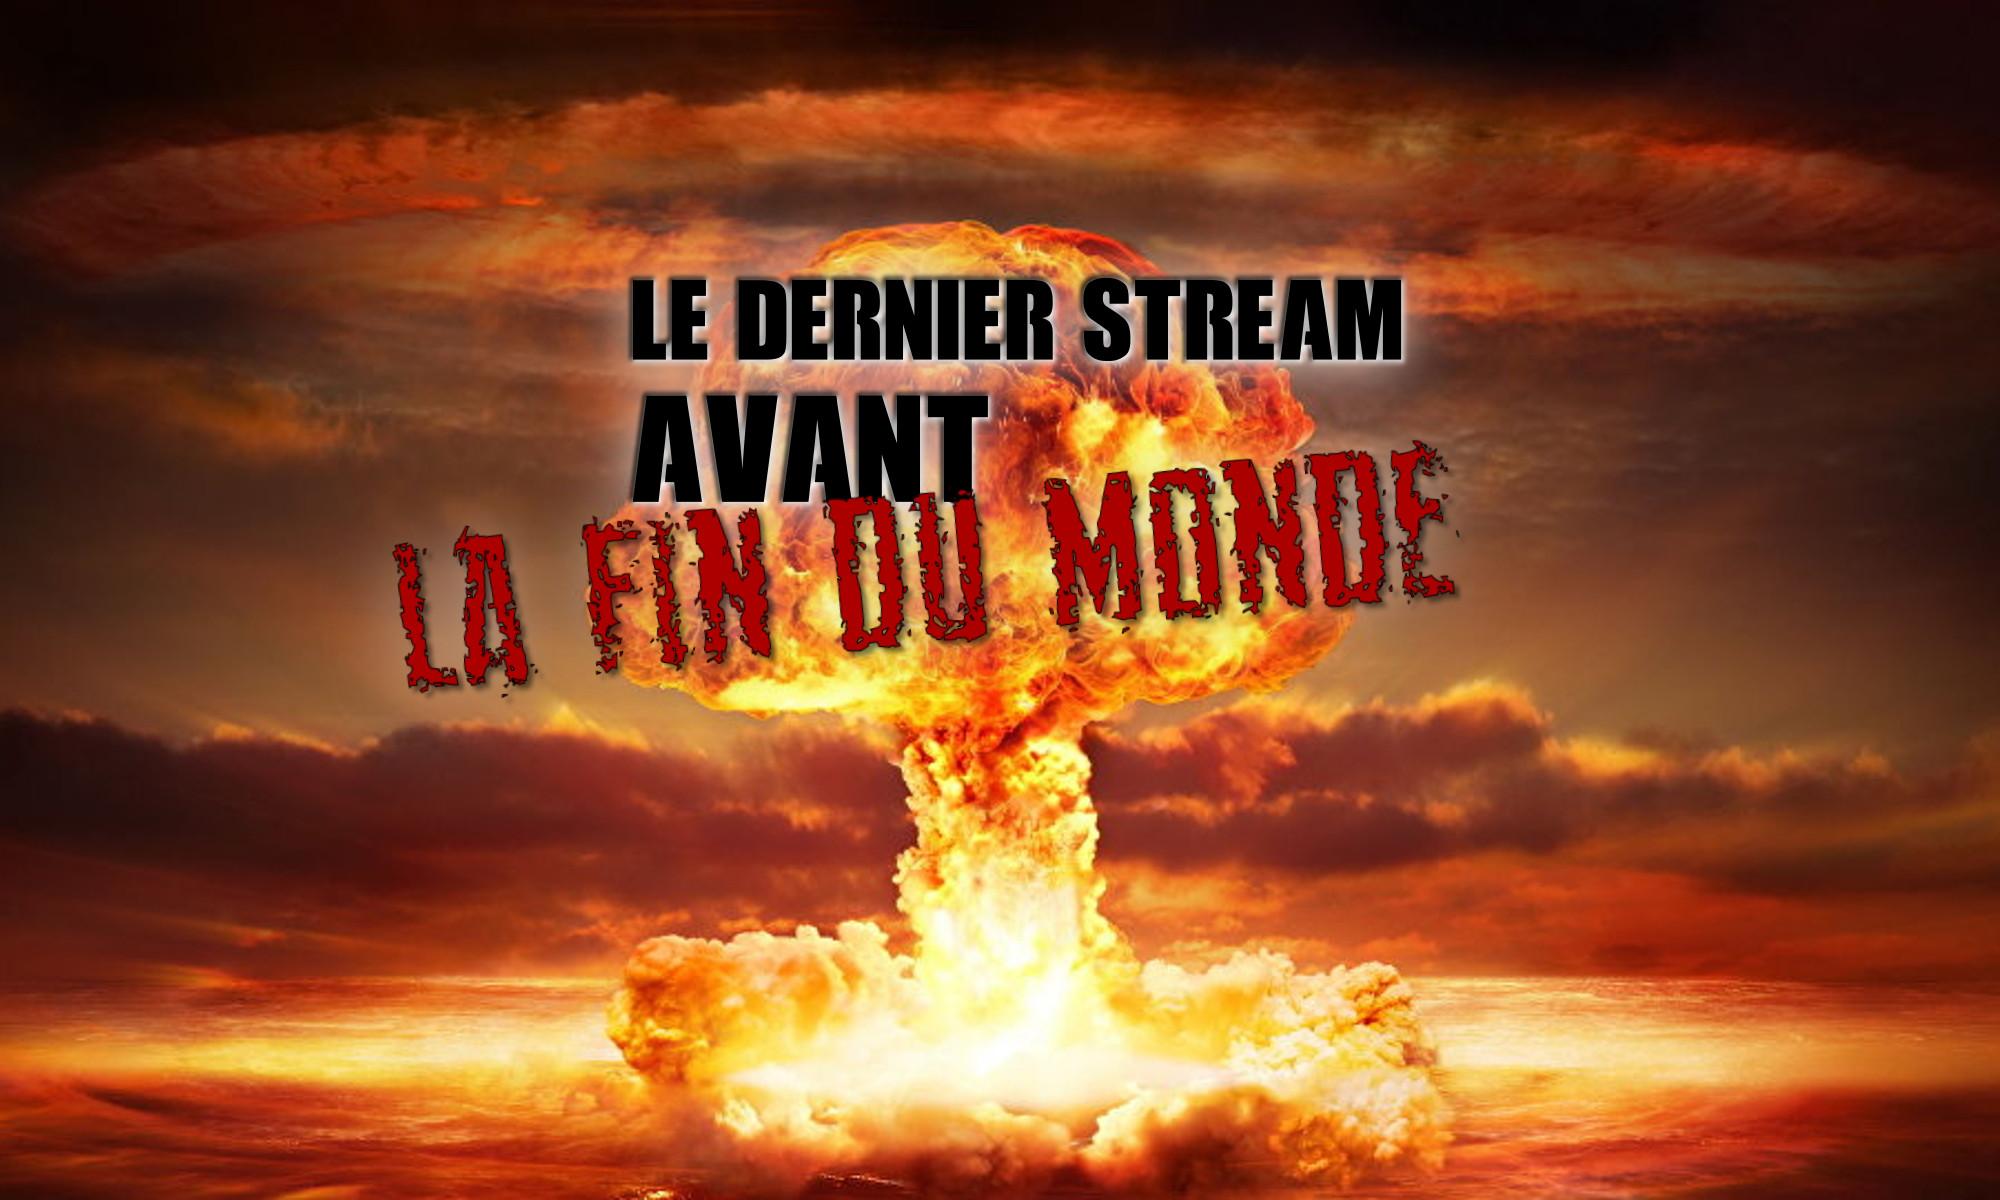 Le Dernier Stream Avant la Fin du Monde